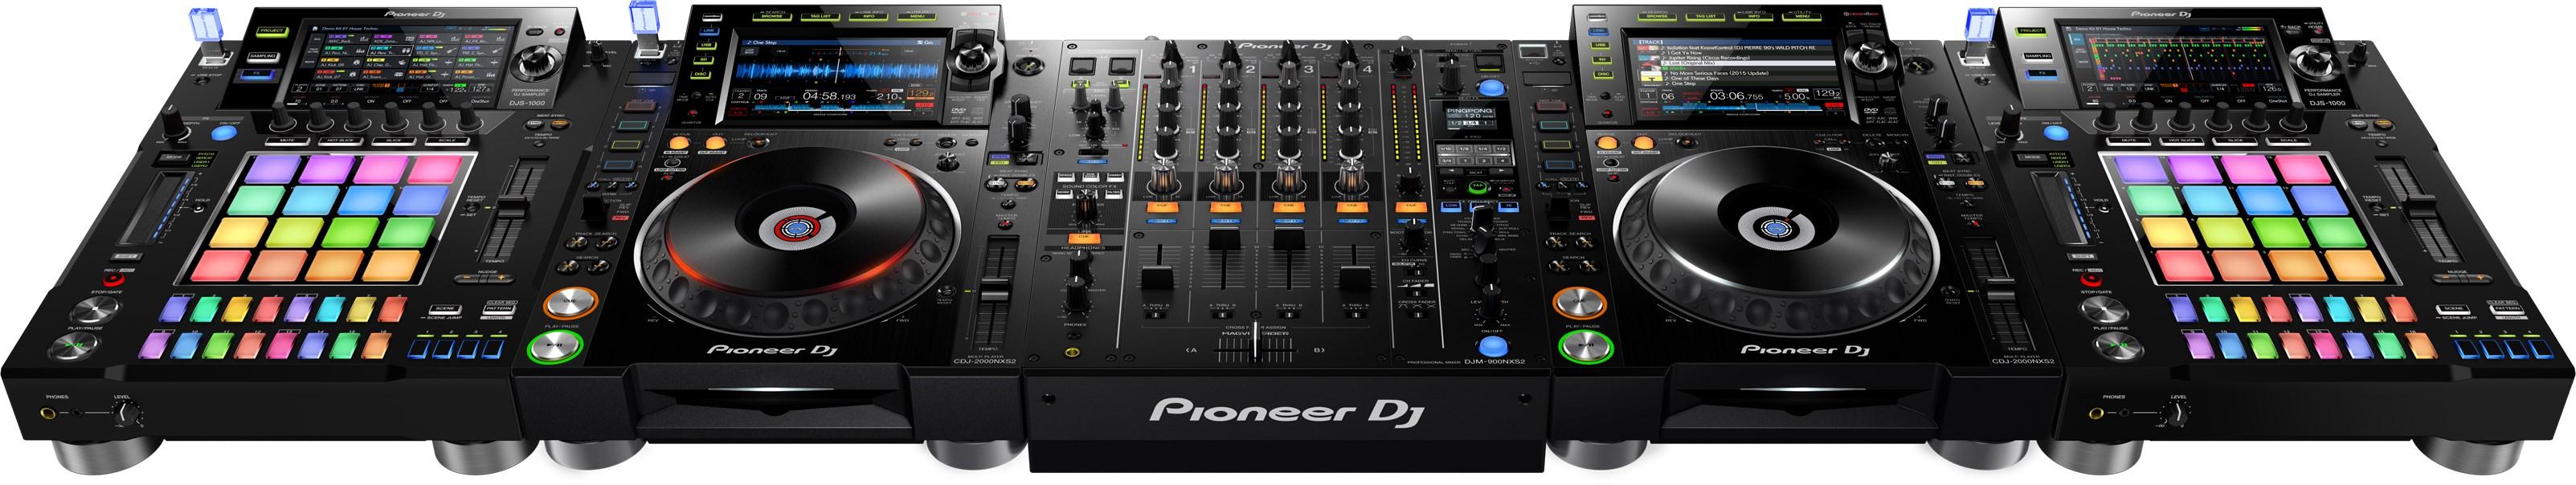 dj sampler, djs-1000, pioneer dj, sounds